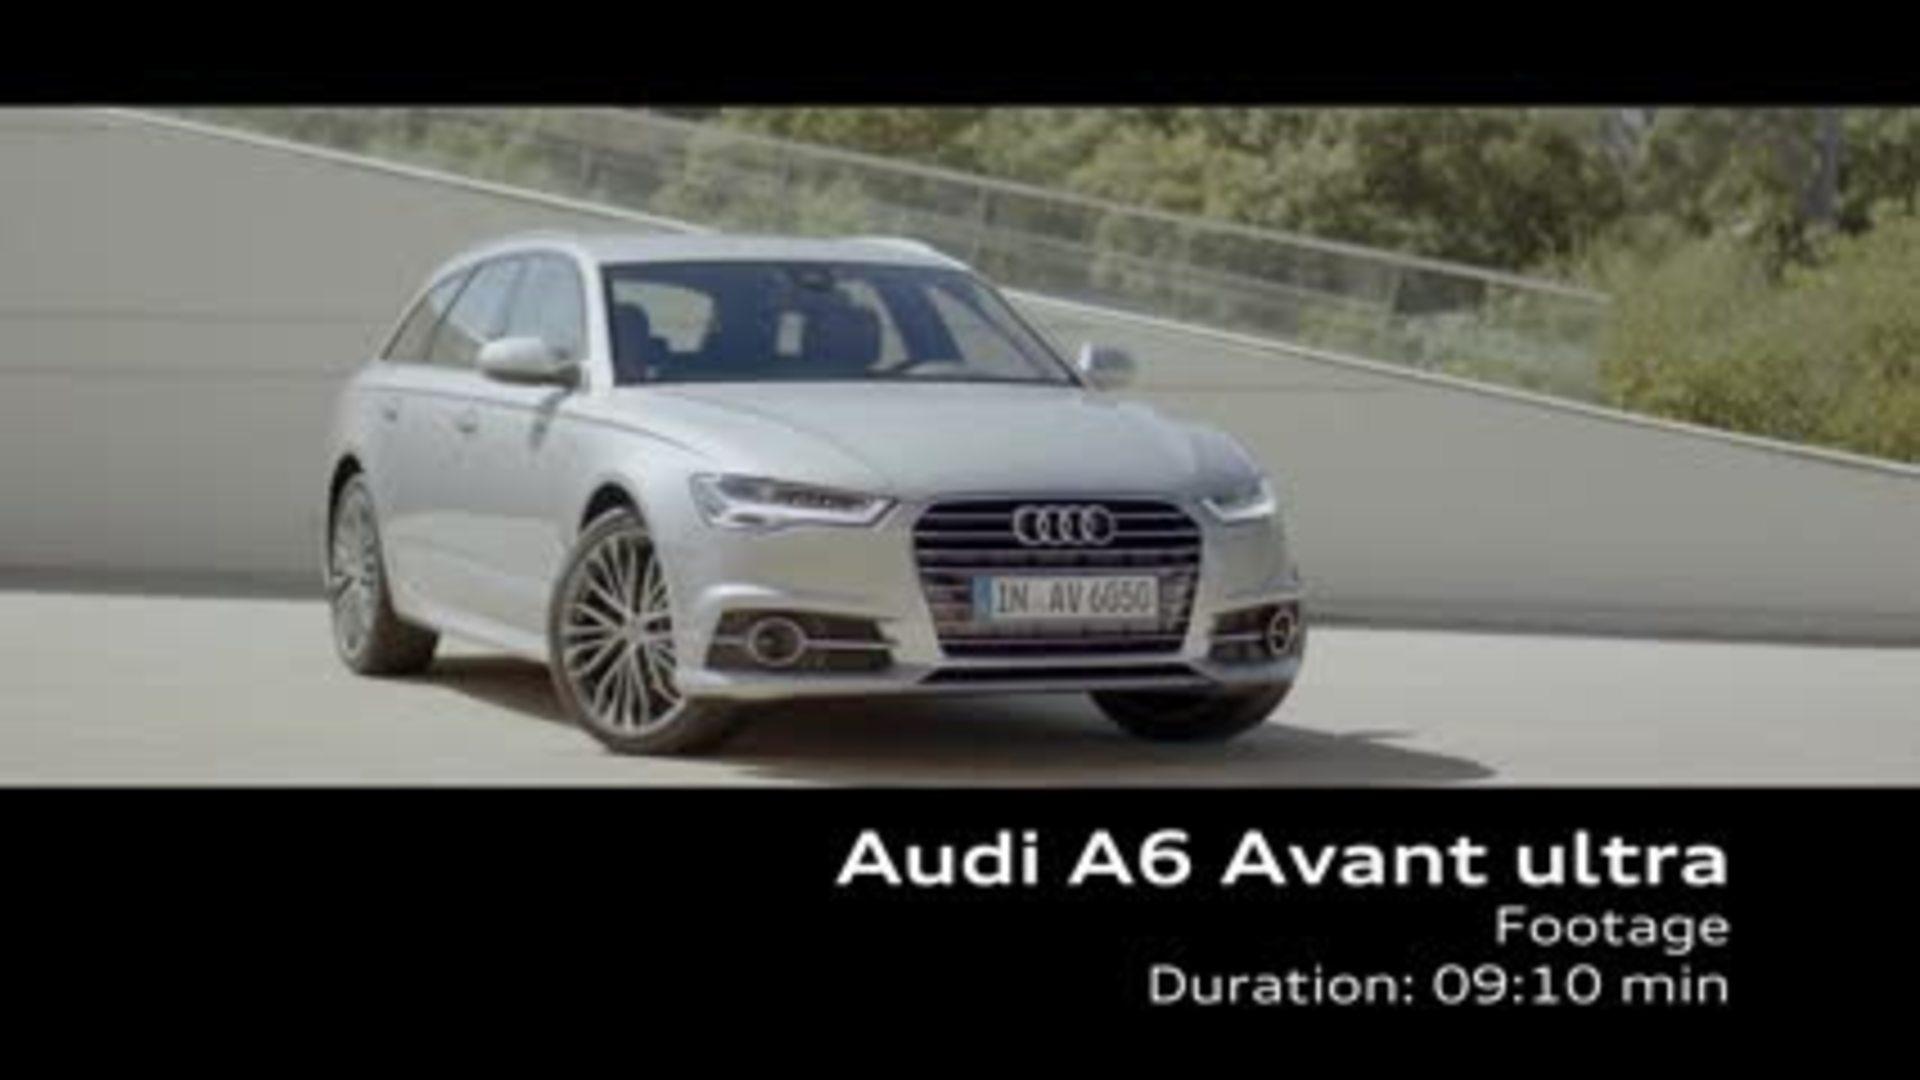 Der Audi A6 Avant ultra - Footage